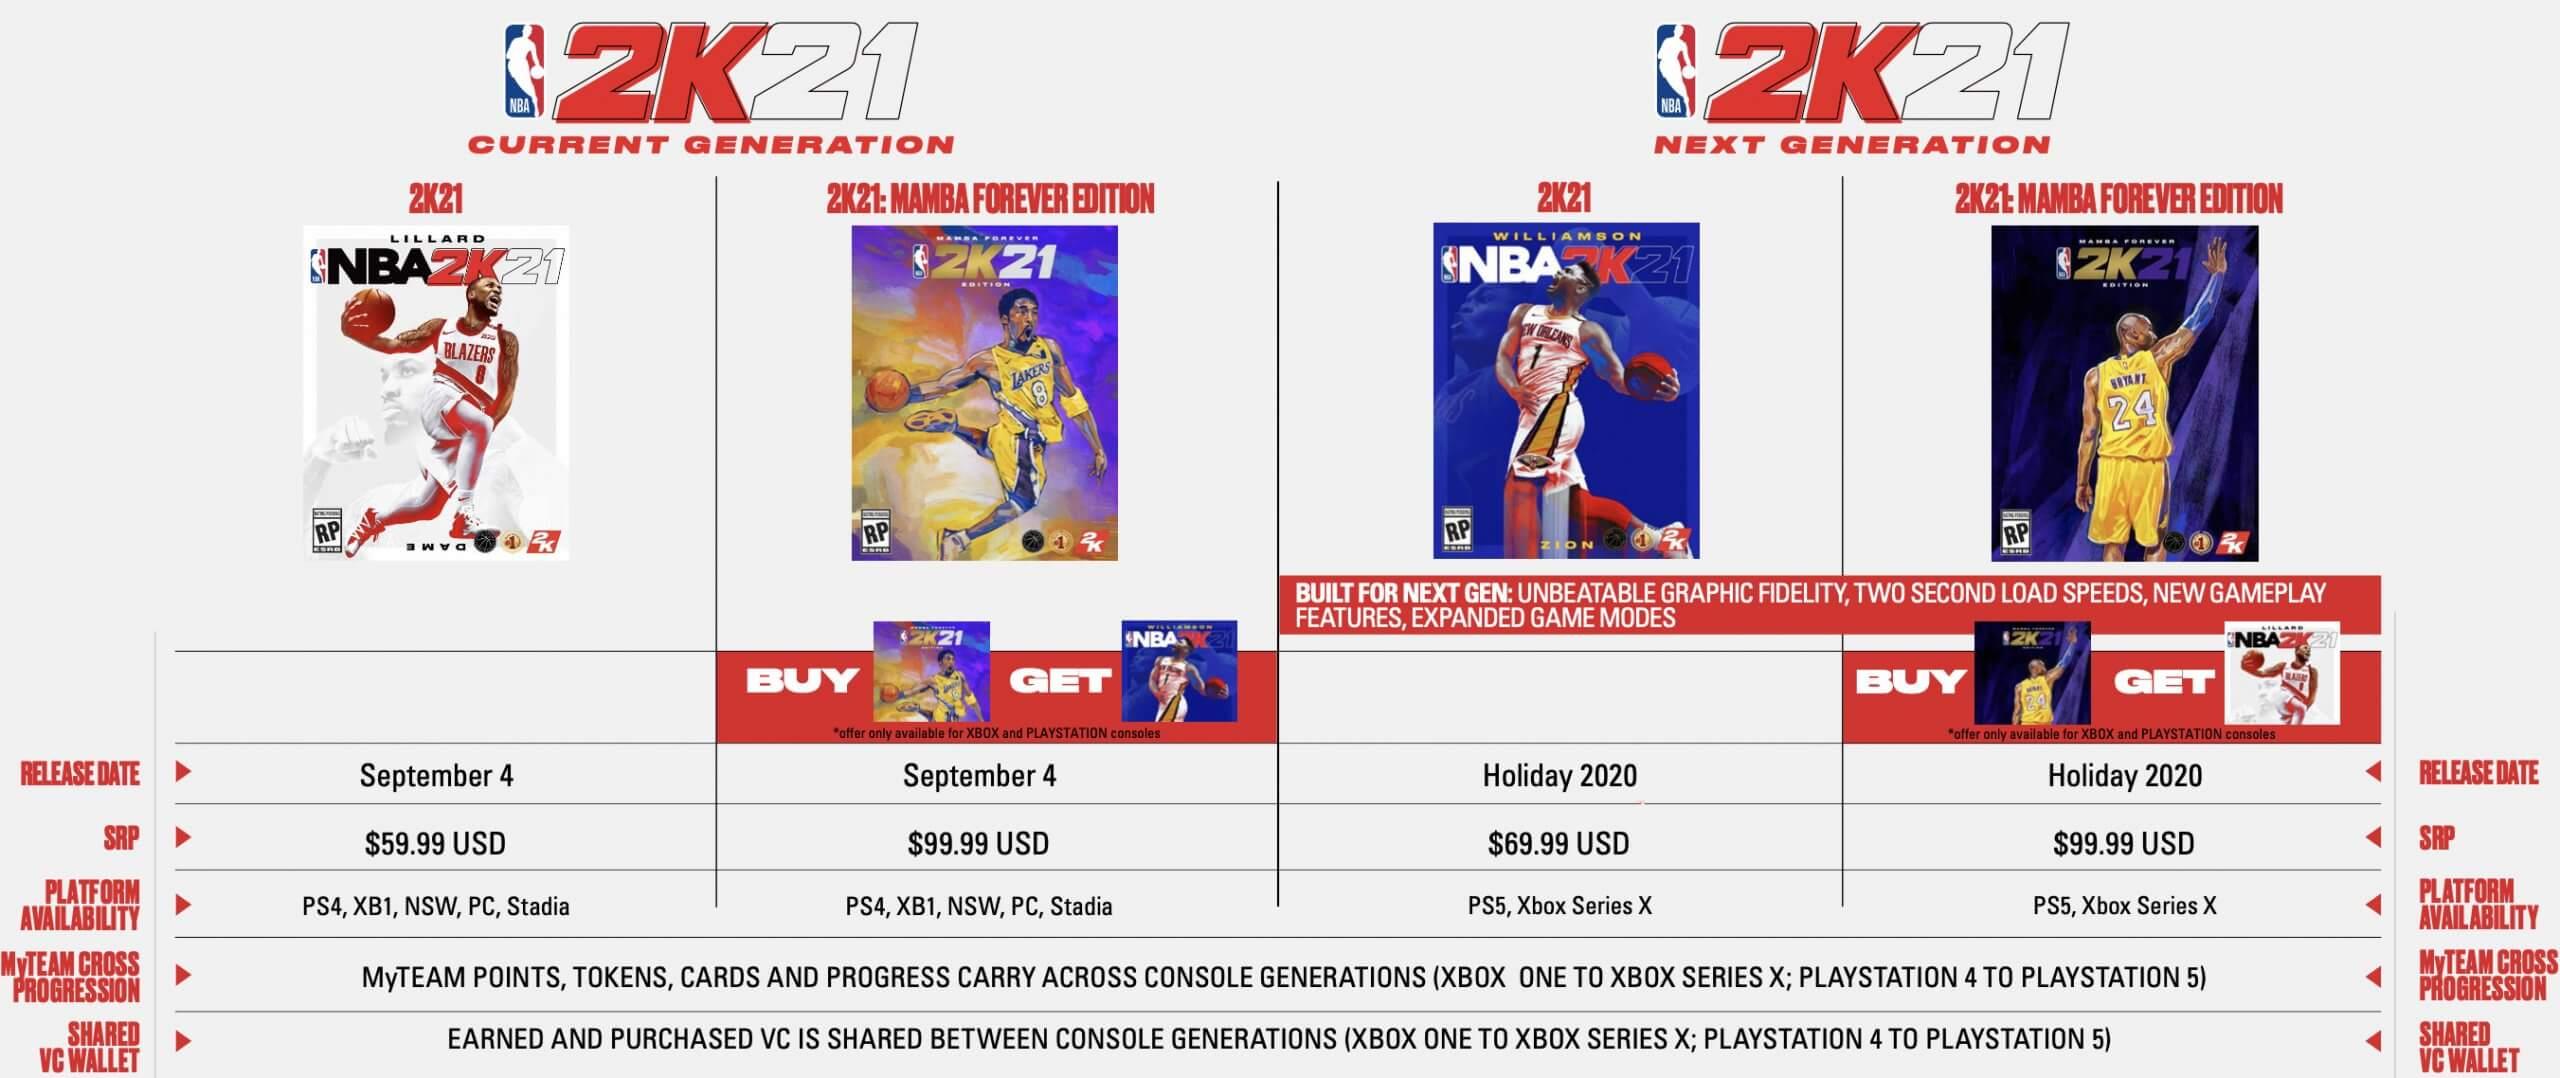 NBA 2K21 current-gen and next-gen prices and platforms